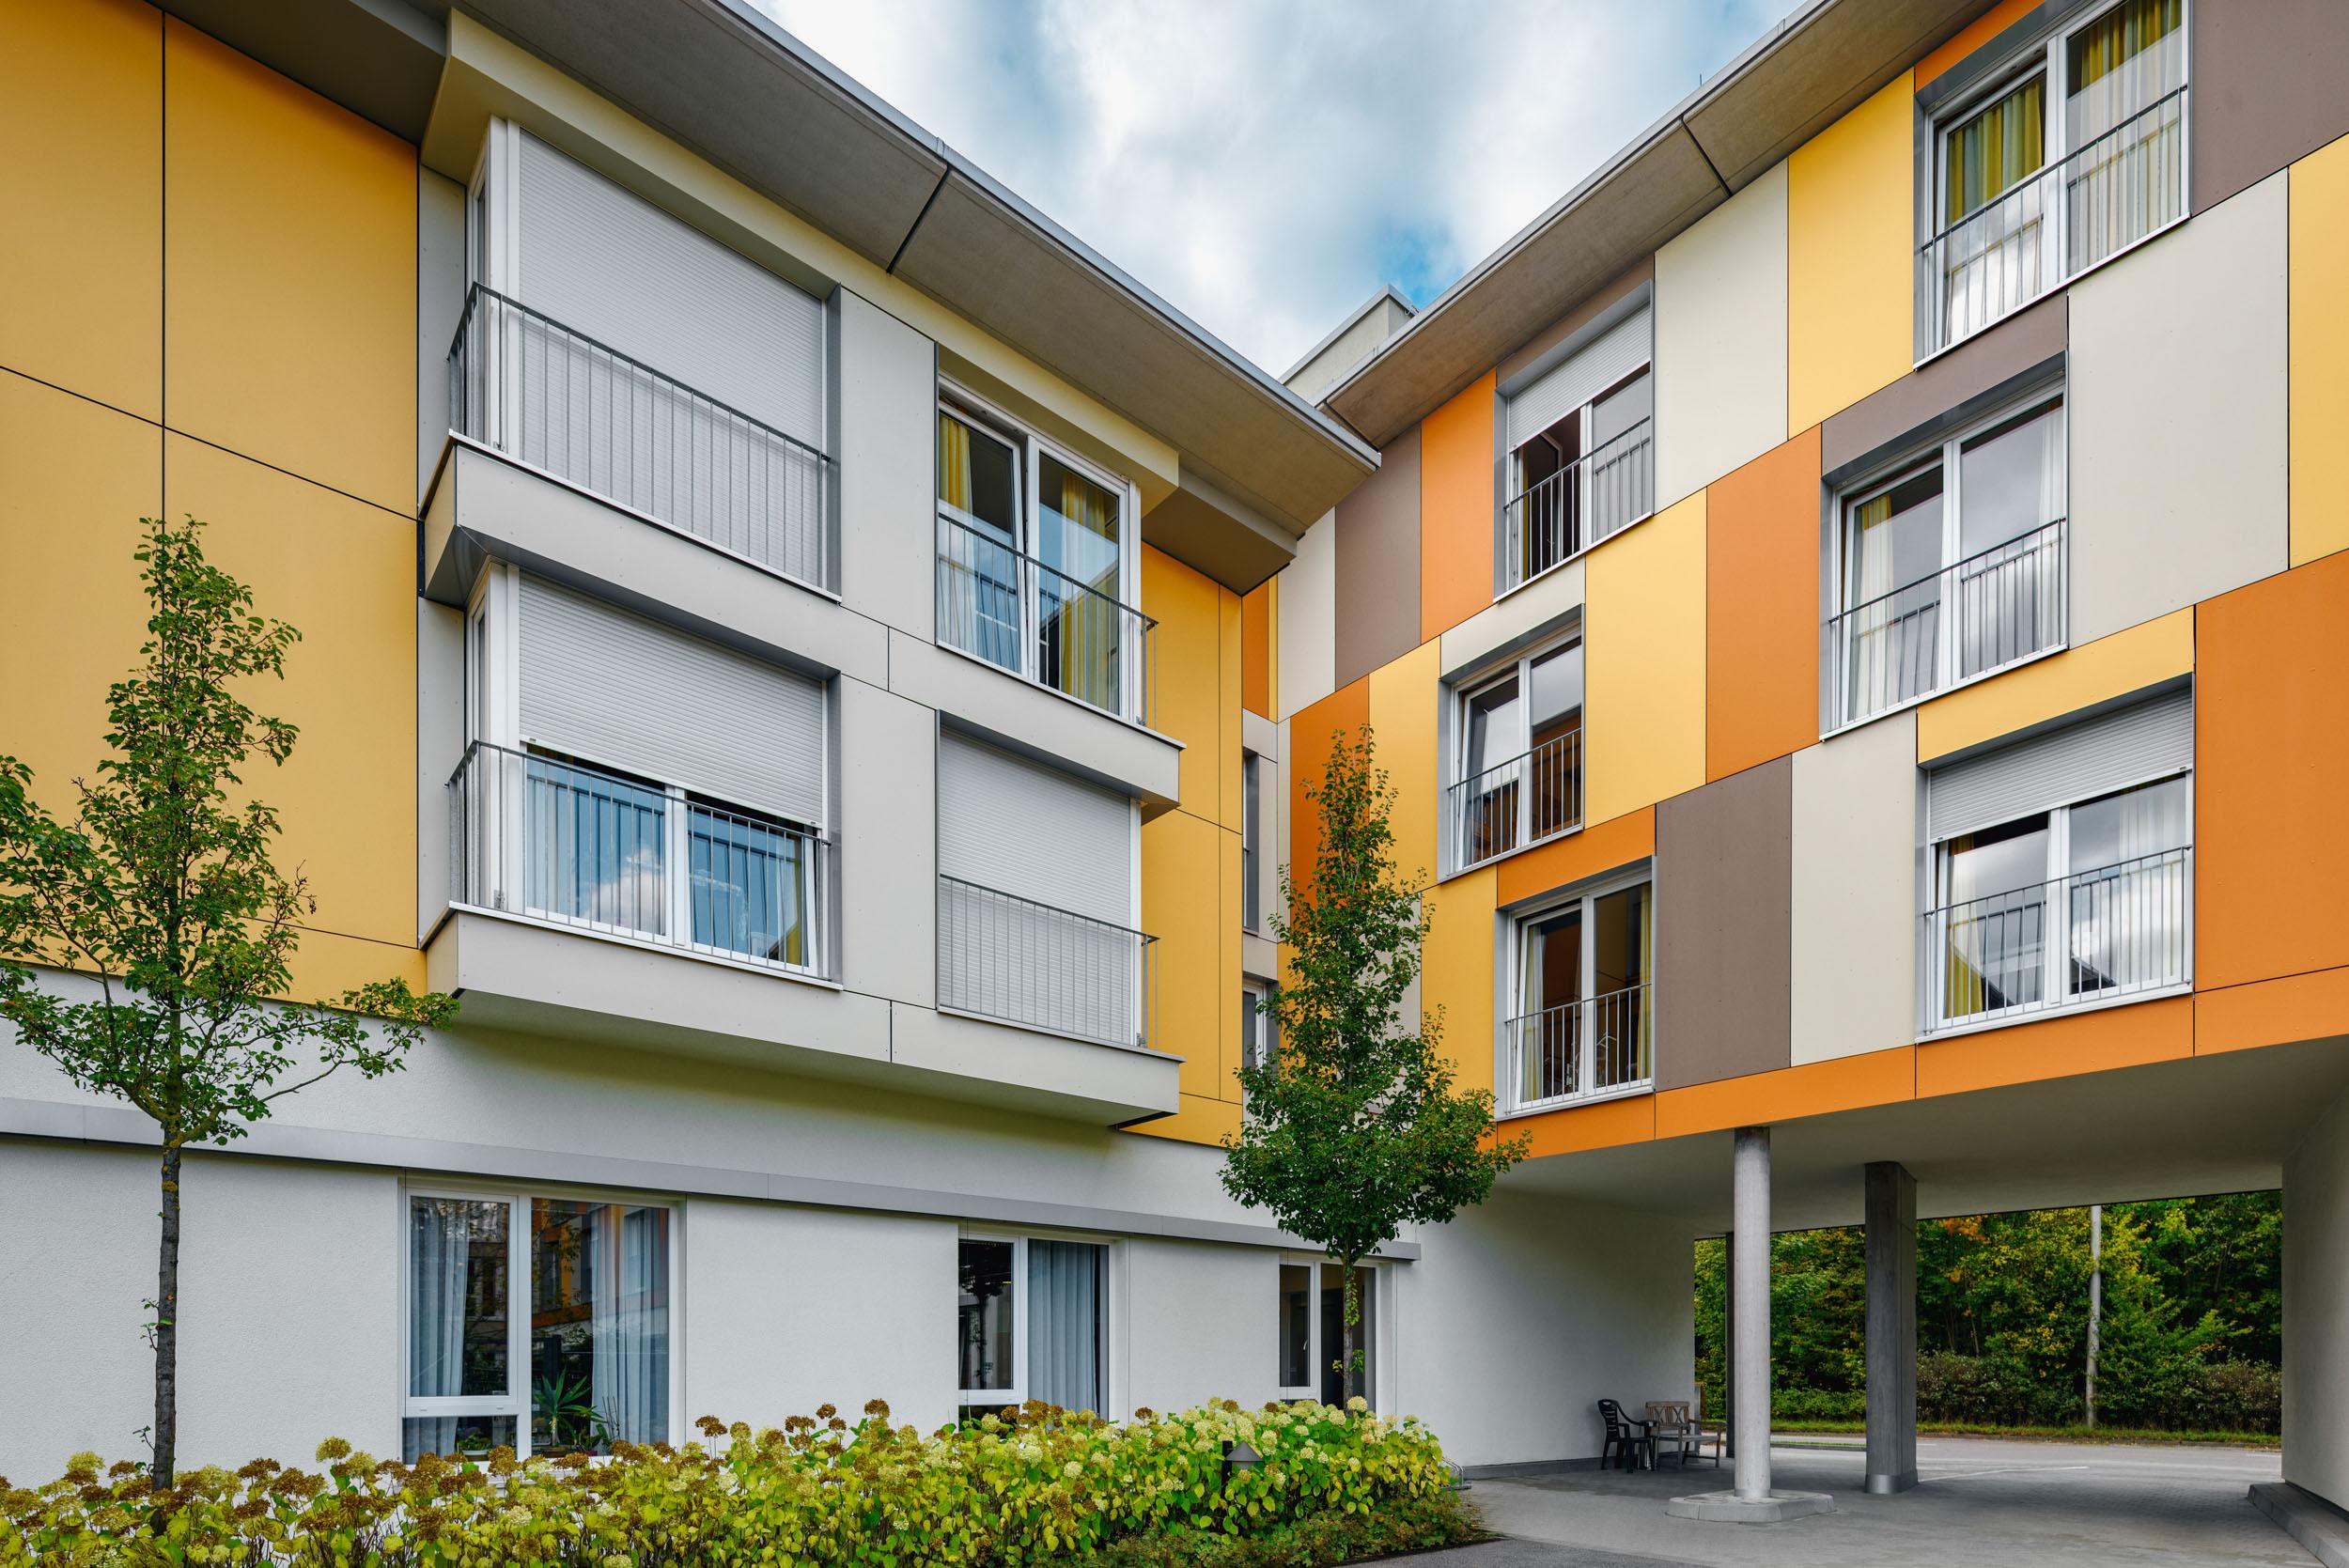 Gustav-Epple-Bauunternehmung-Gesundheit-Pflege-Waldau-StuttgartWaldau_MLX7750#00